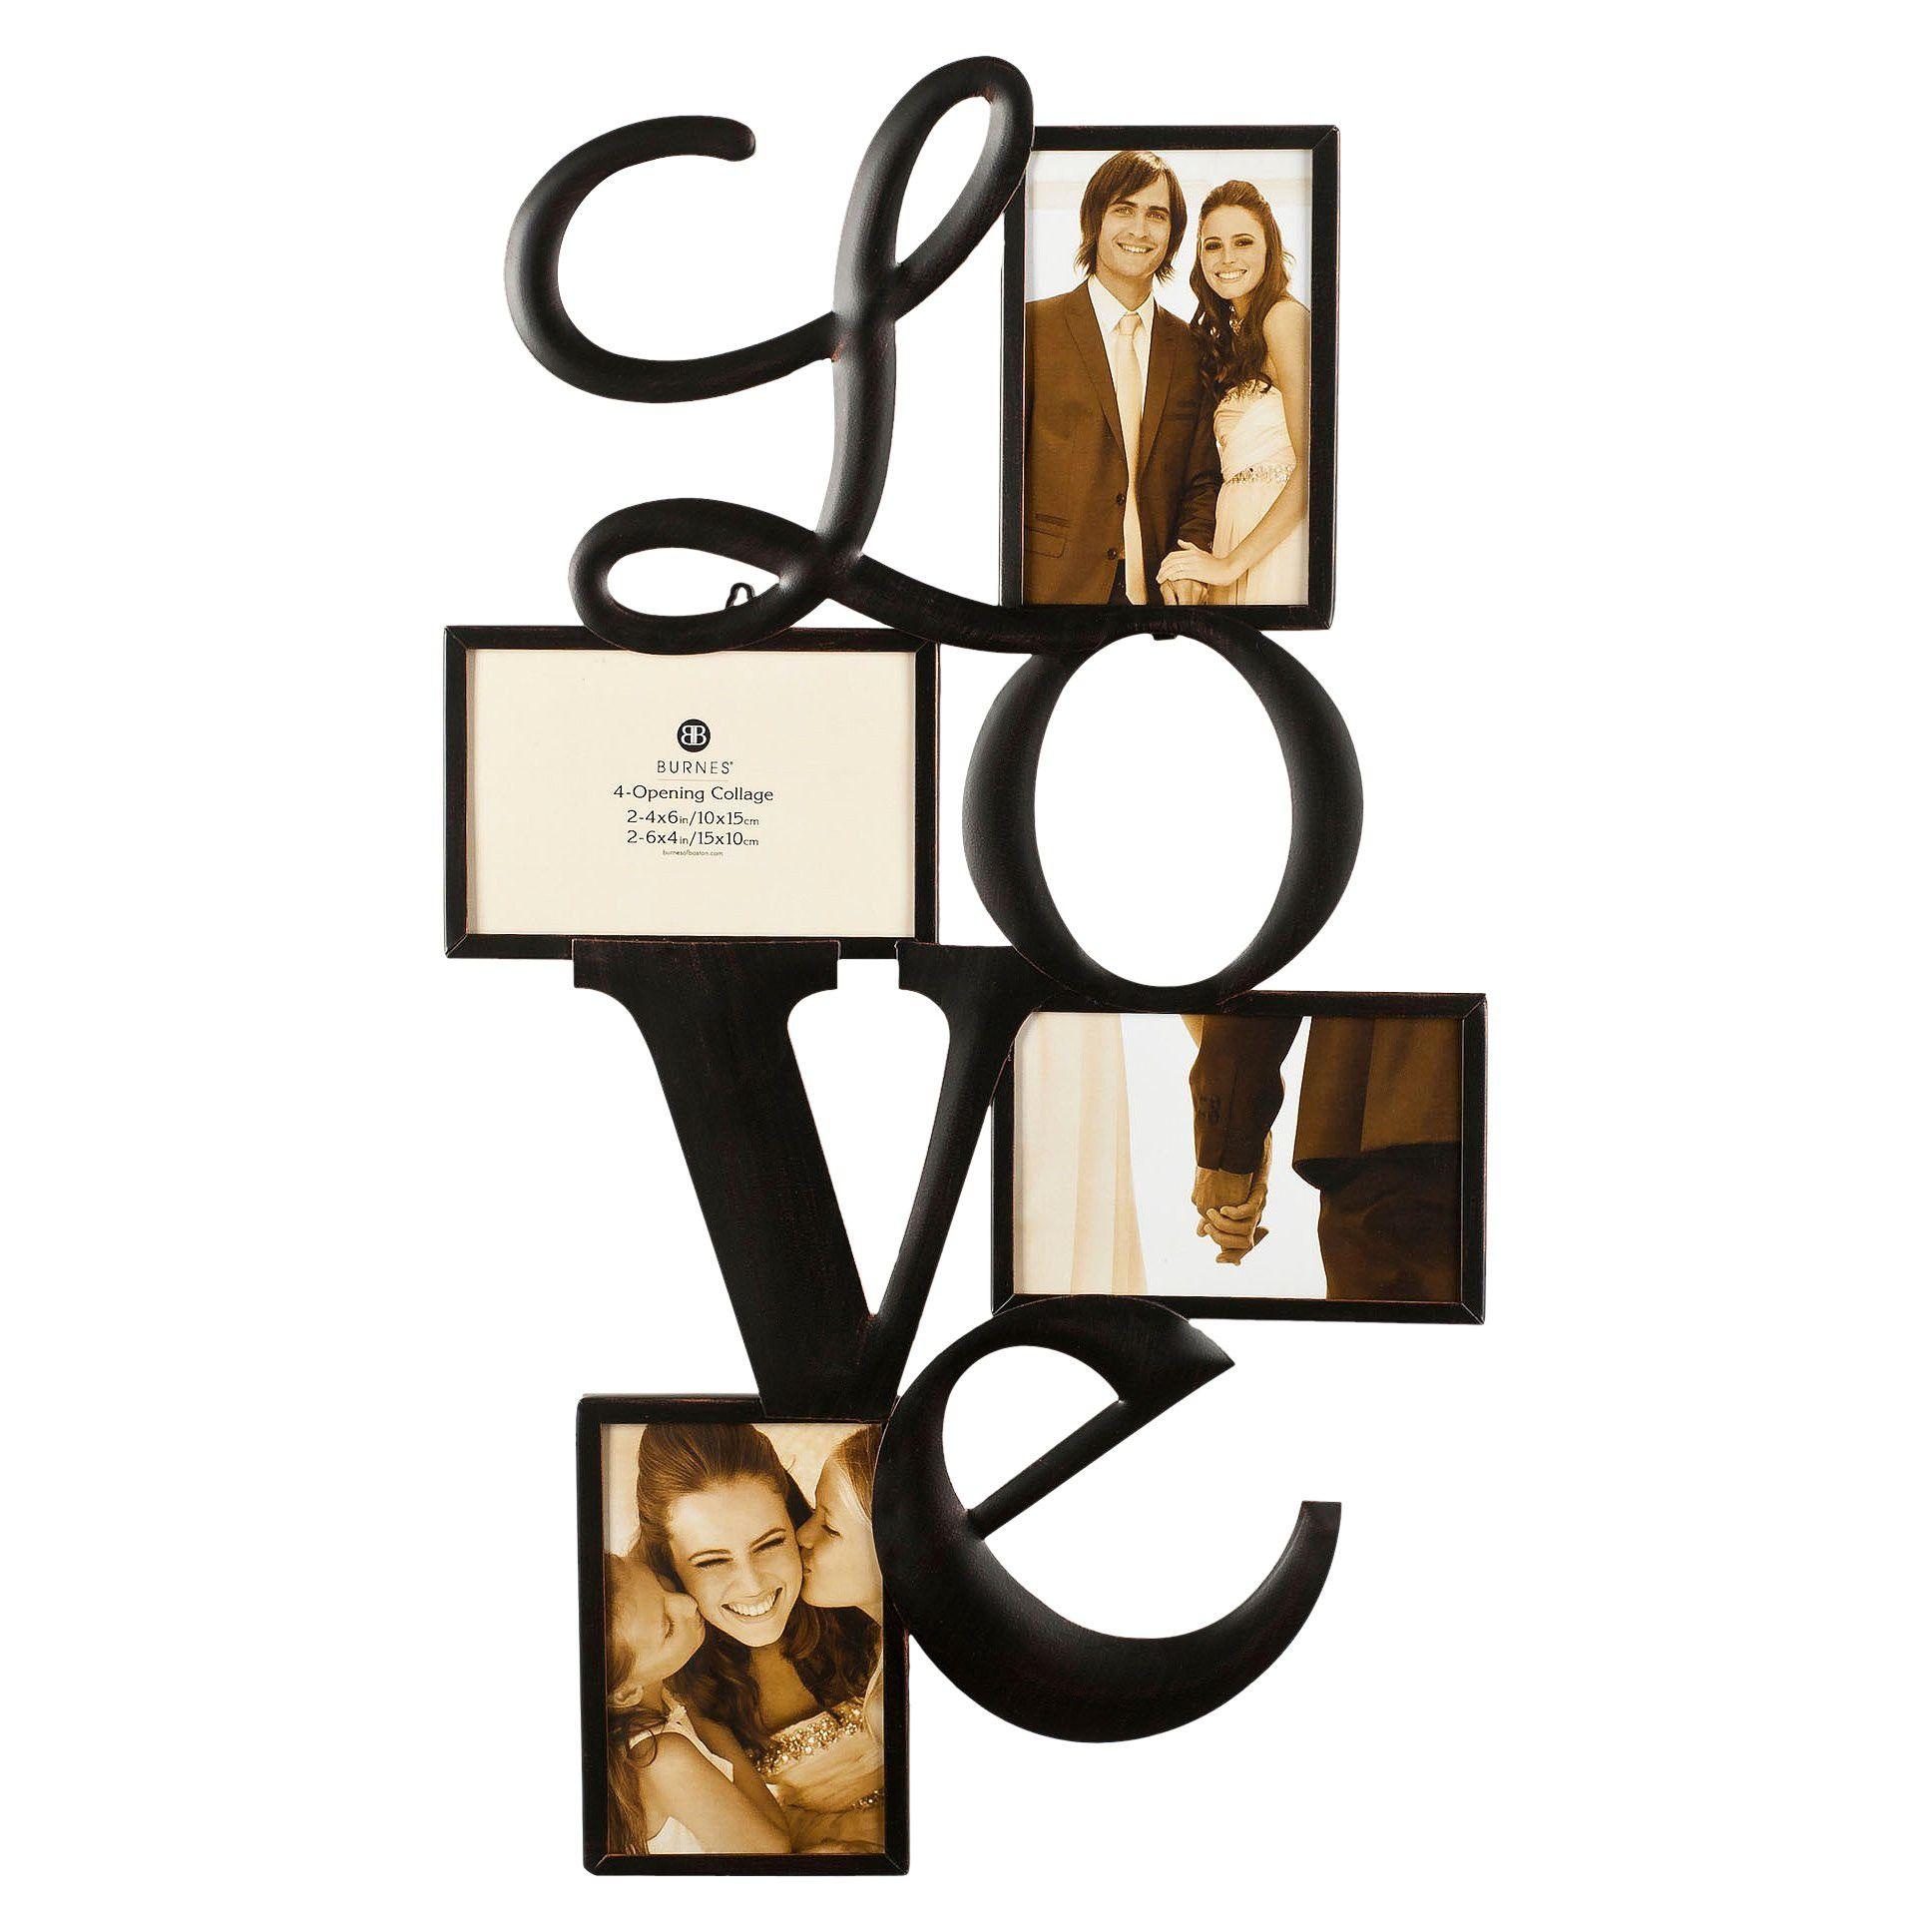 Burnes 4-Opening Venetian Copper Love Collage Frame, Black   Home ...